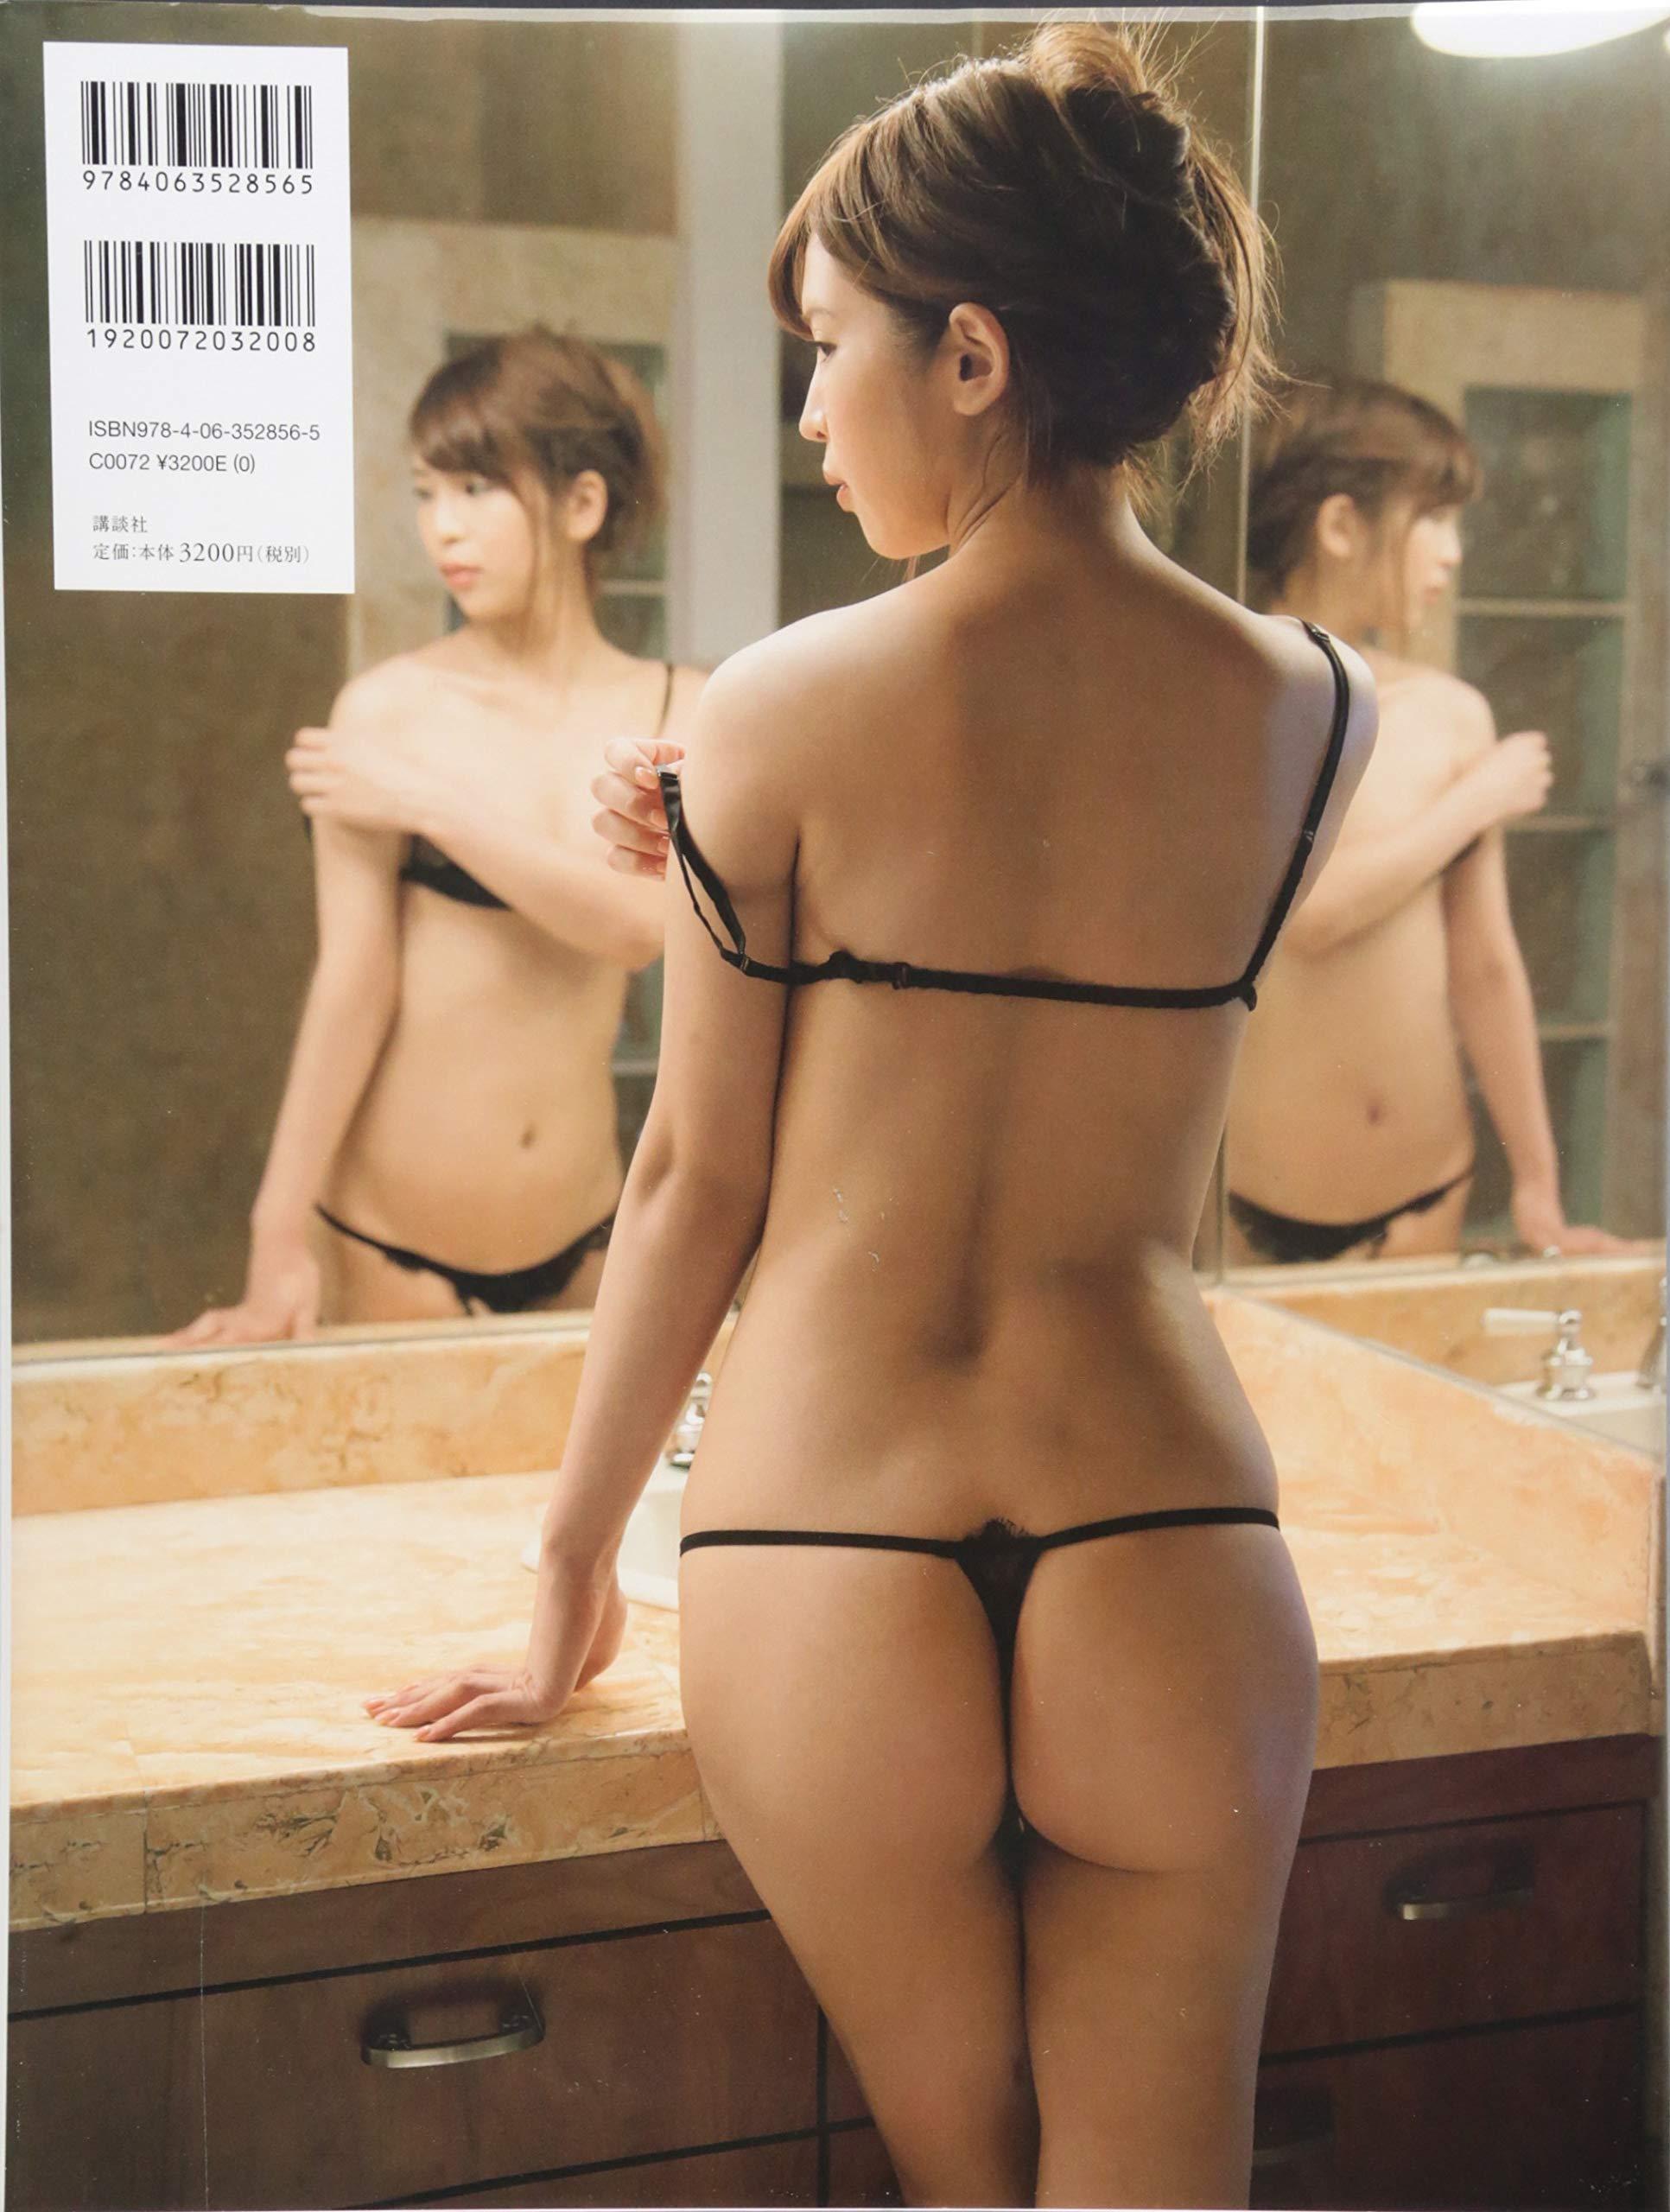 anri sakaguchi nude 写真集 Porn Image